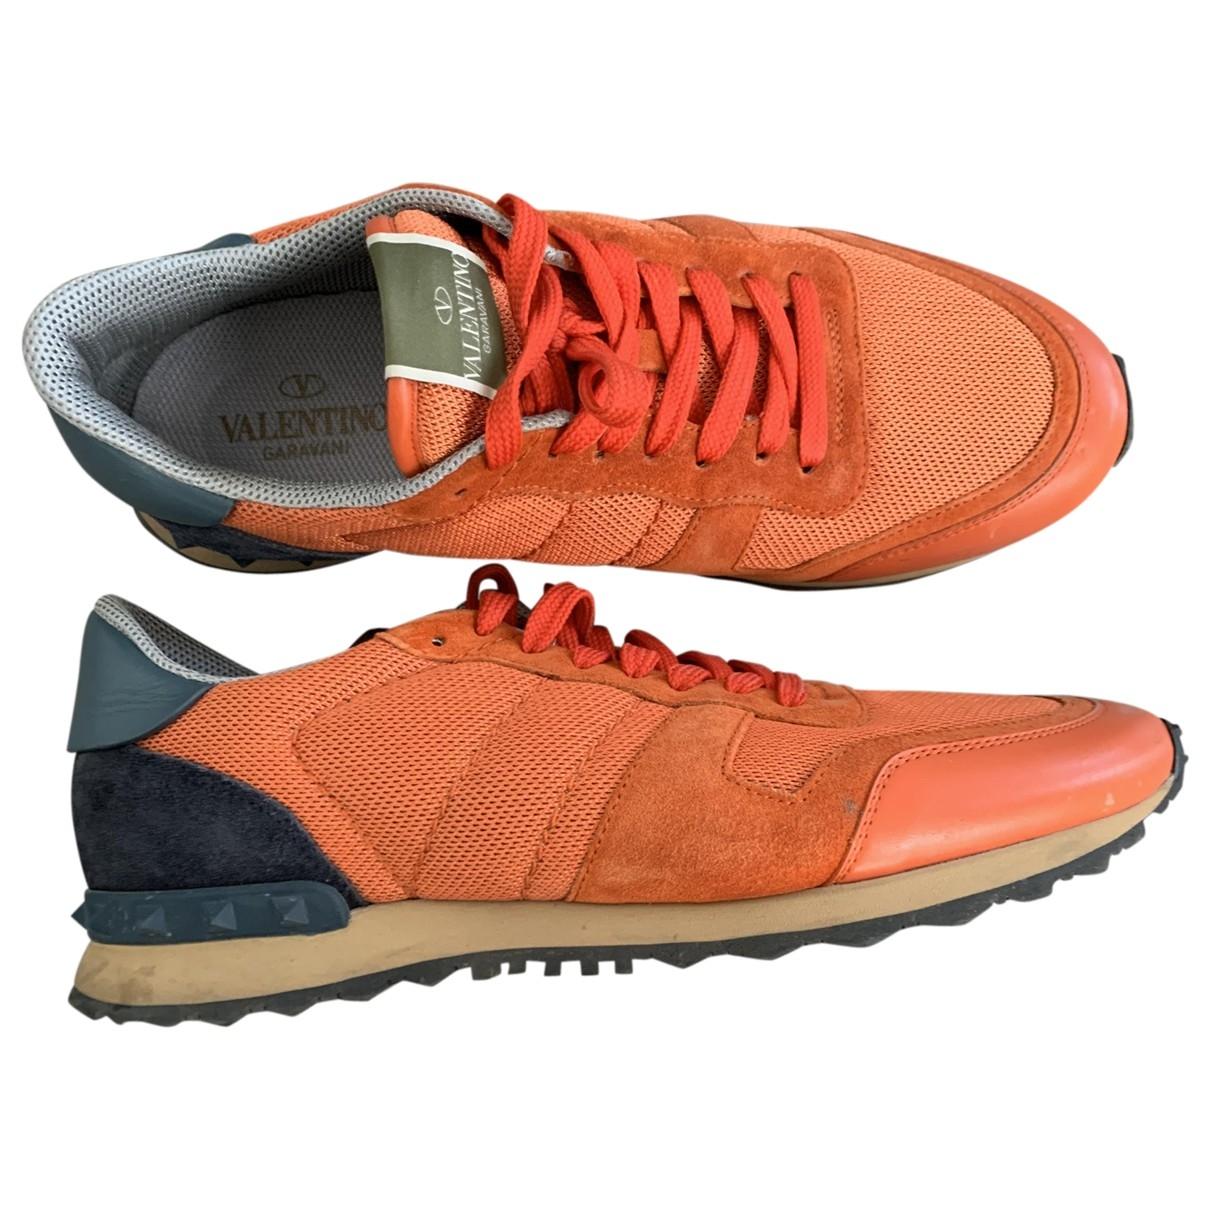 Valentino Garavani - Baskets   pour homme en toile - orange